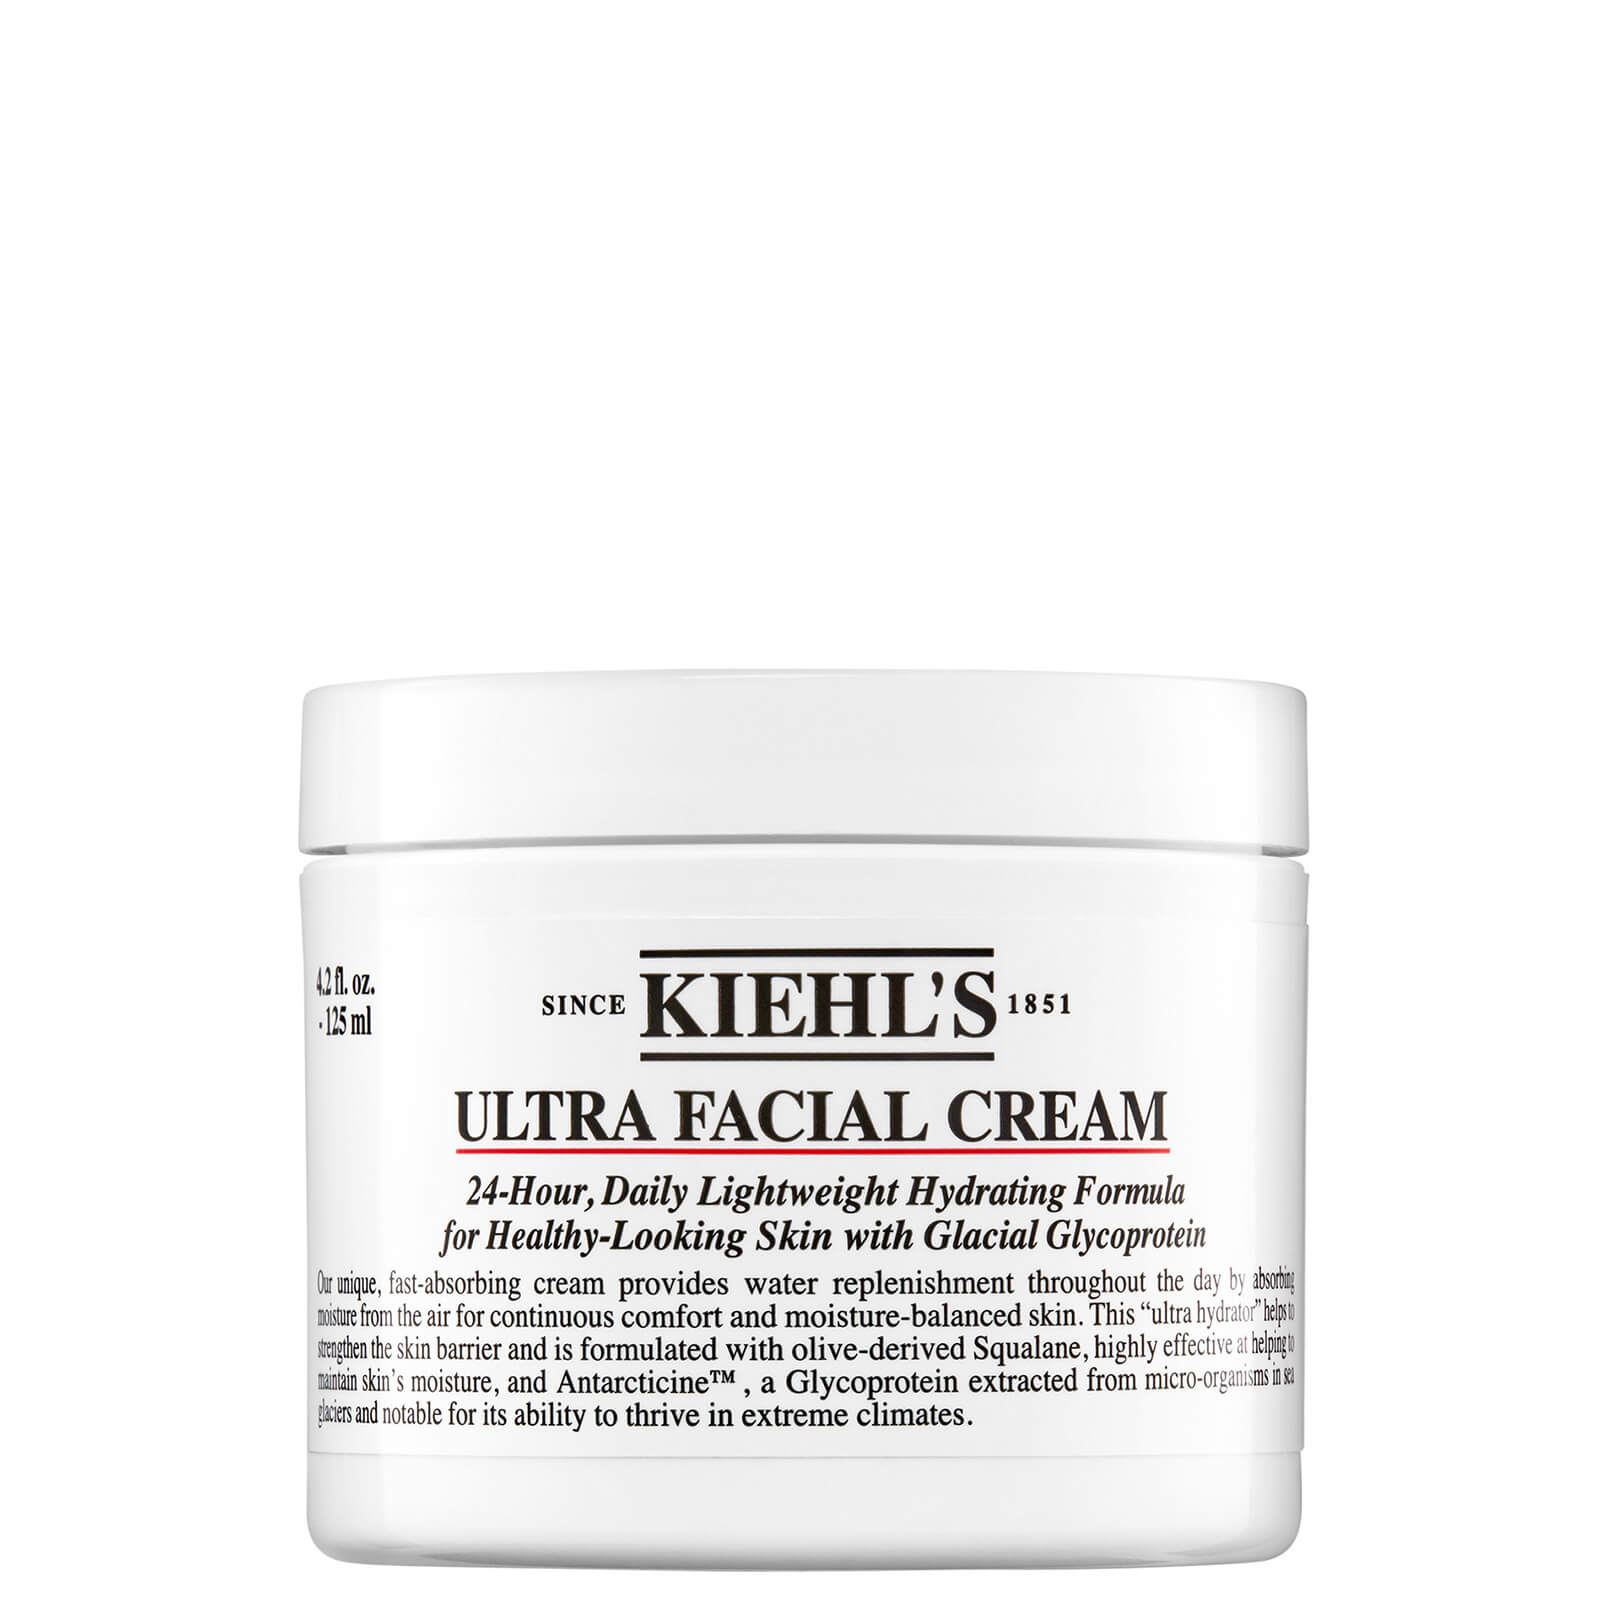 Kiehl's Ultra Facial Cream (Various Sizes) - 125ml